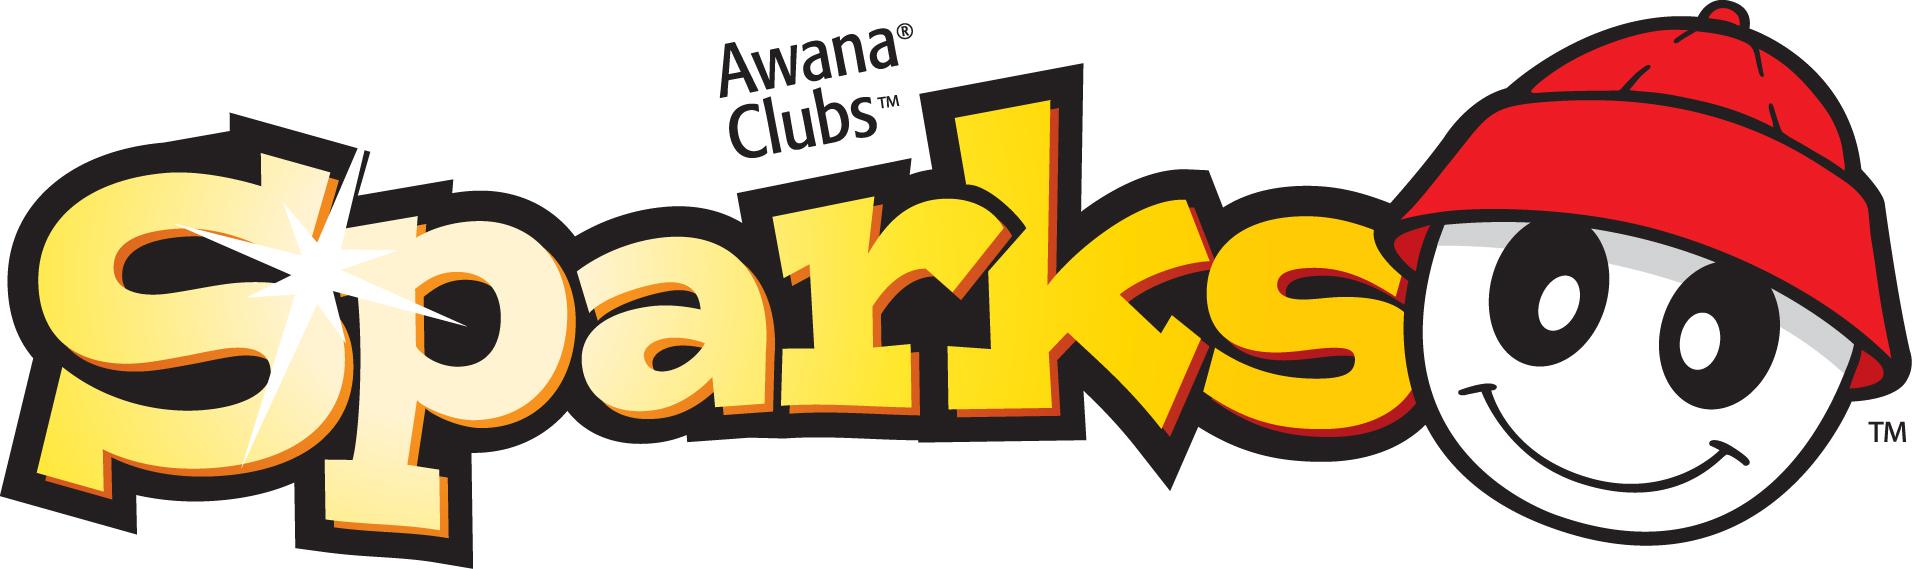 Awana clipart new tt logo png transparent library Awana clipart new t&t logo - ClipartFest png transparent library